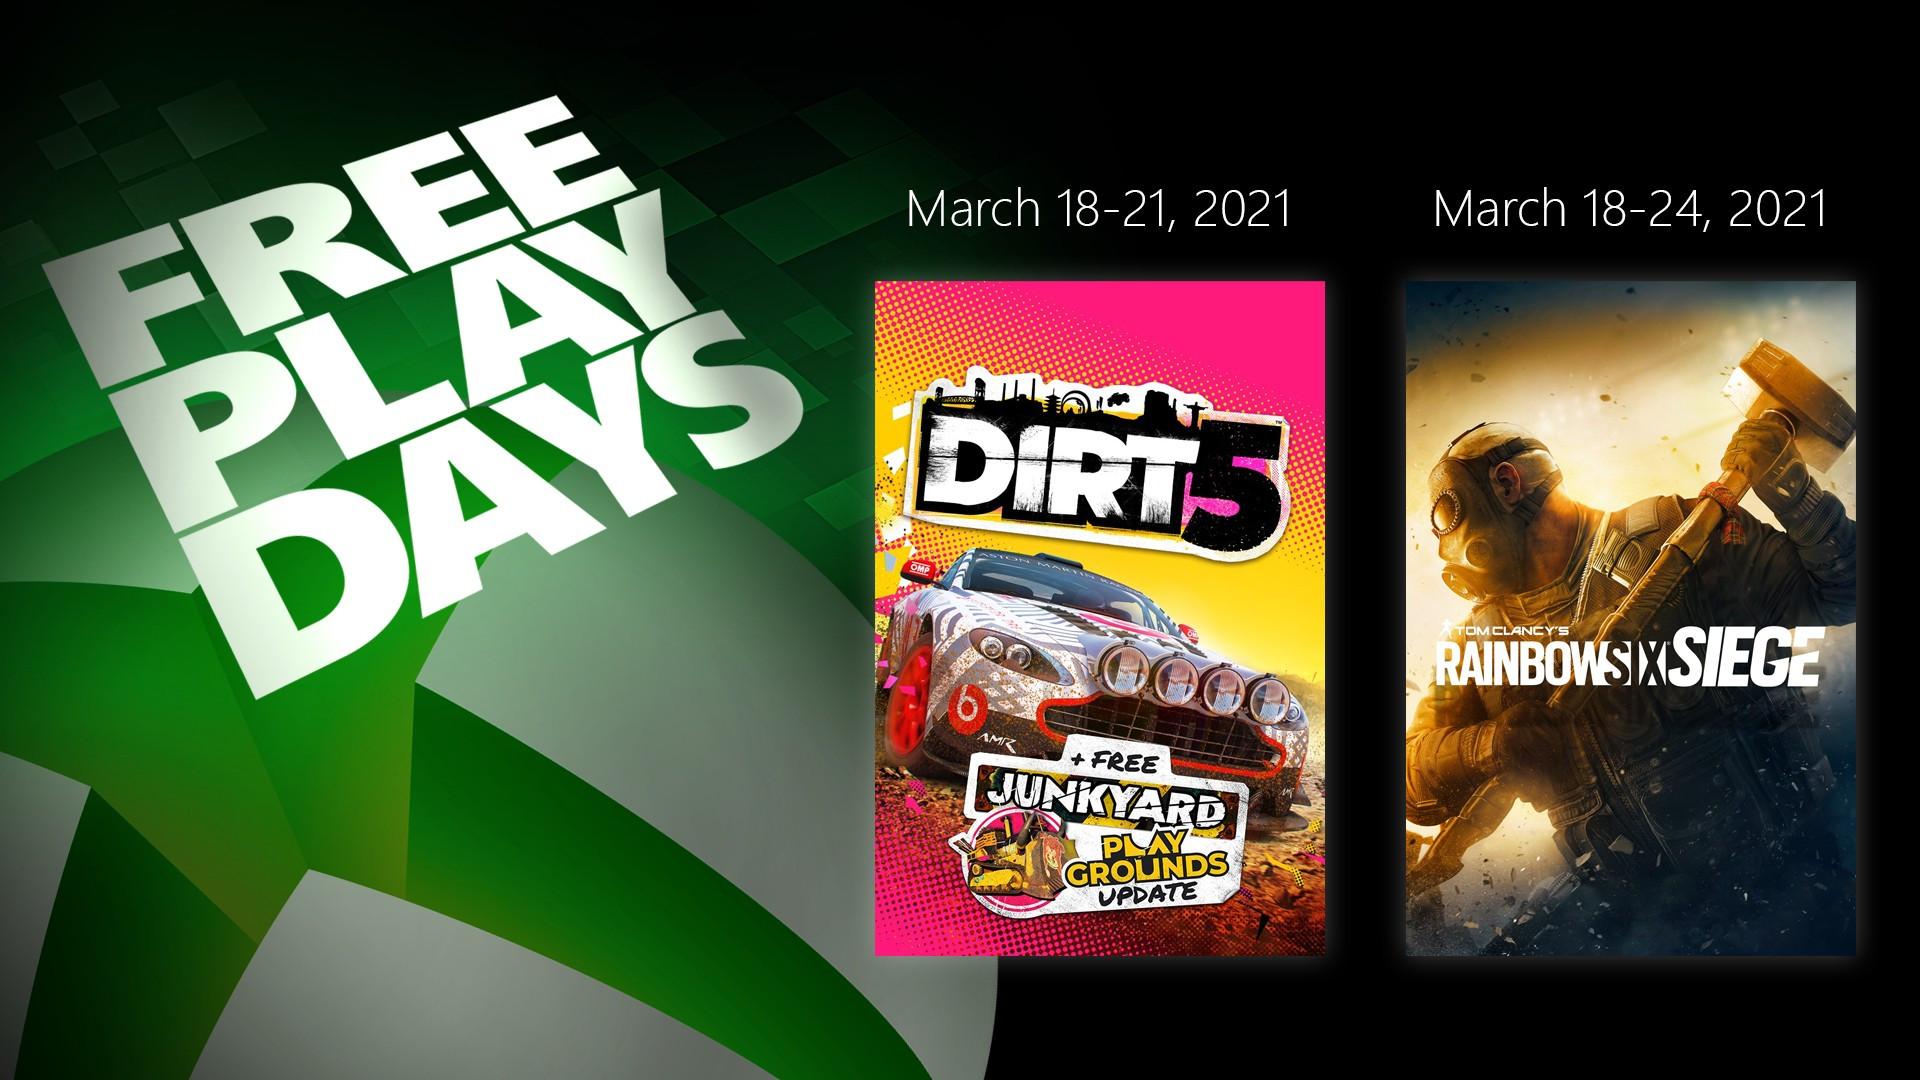 XBL Free Play Days